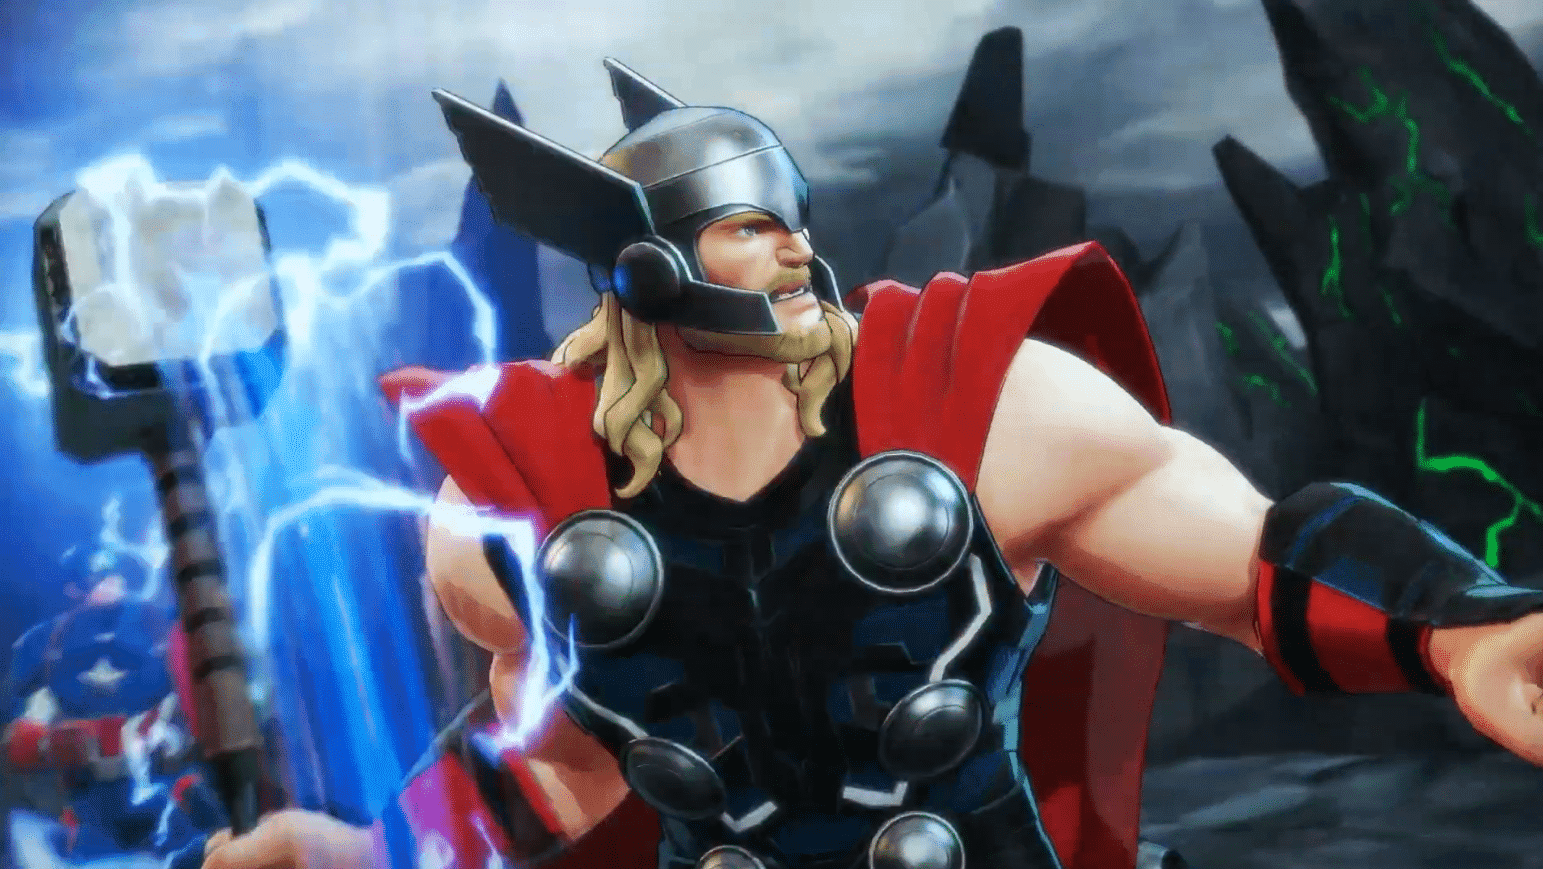 Echad un vistazo al roster completo de personajes de Marvel Ultimate Alliance 3 para Nintendo Switch